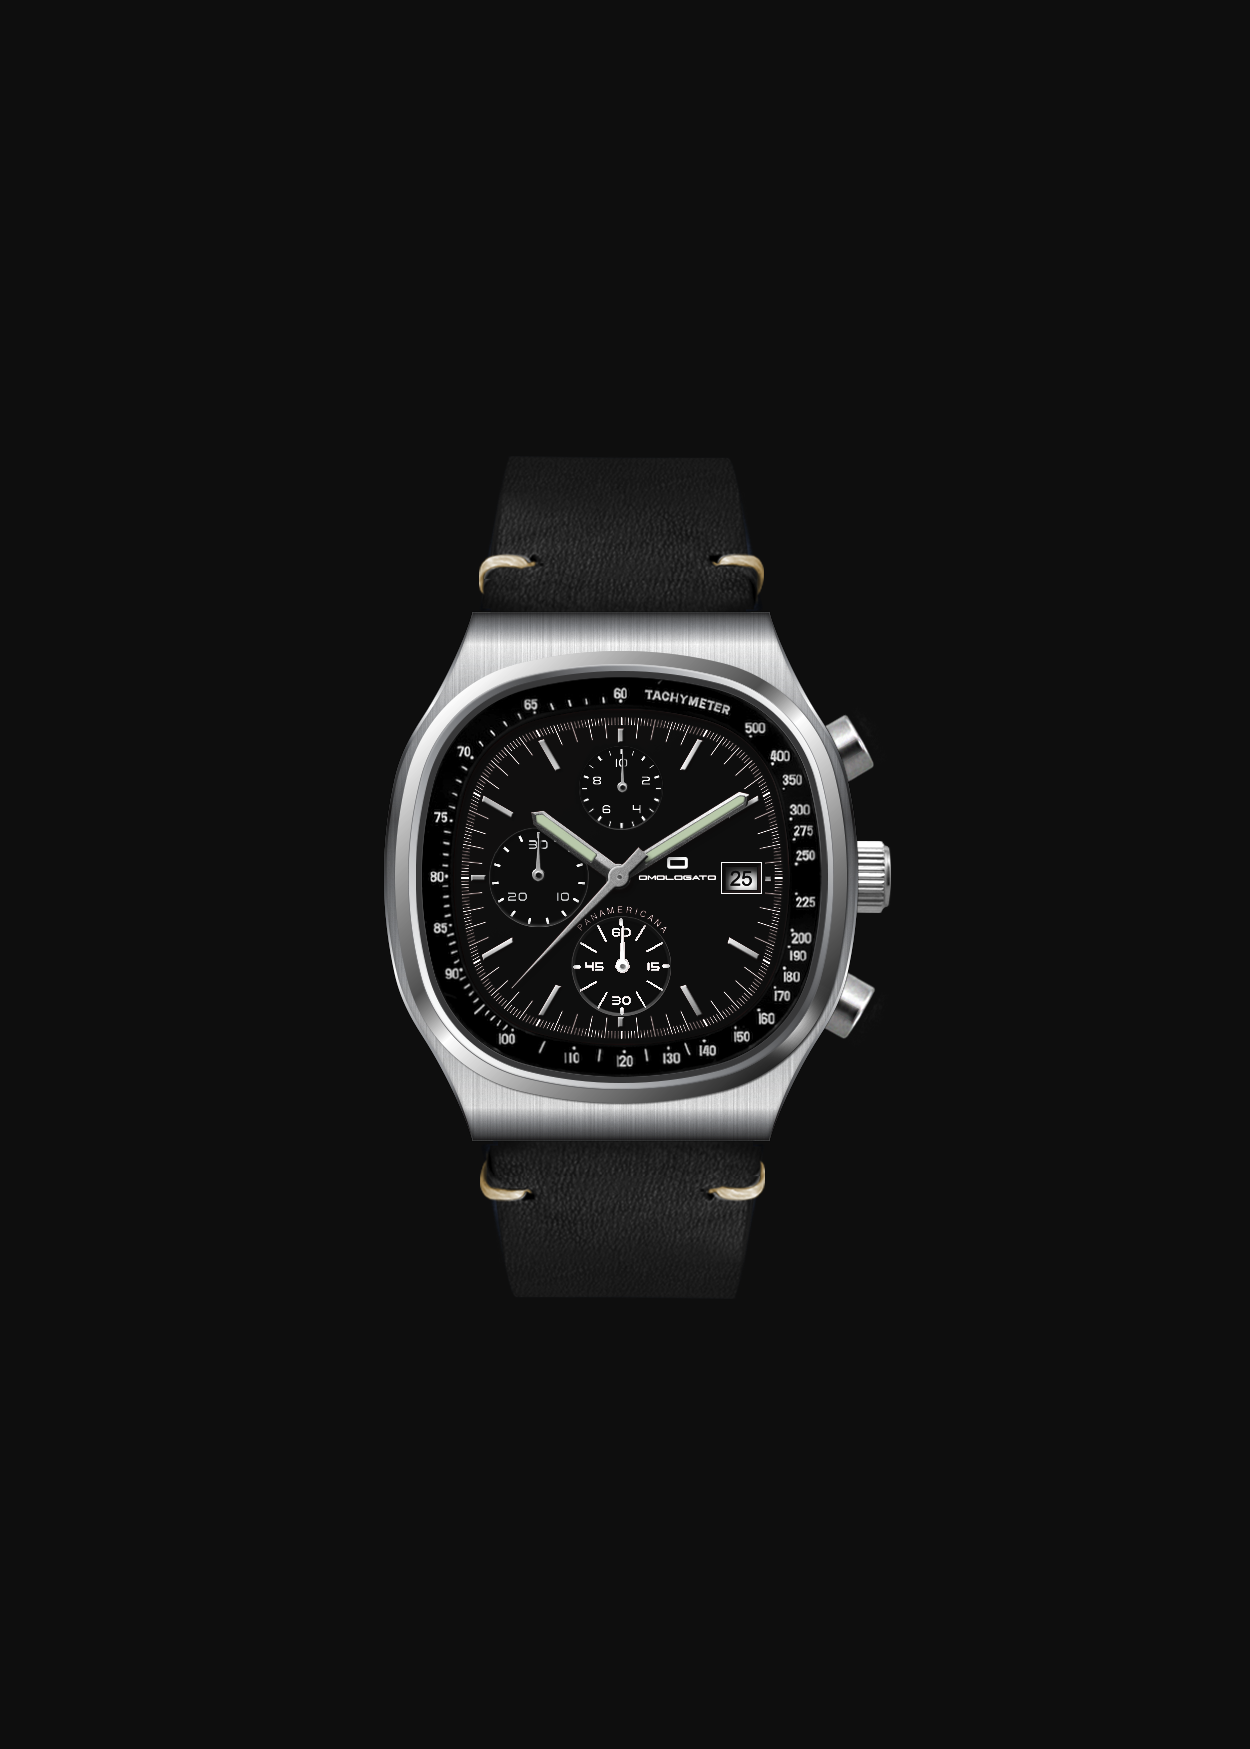 40mm-watch-black-copy.png